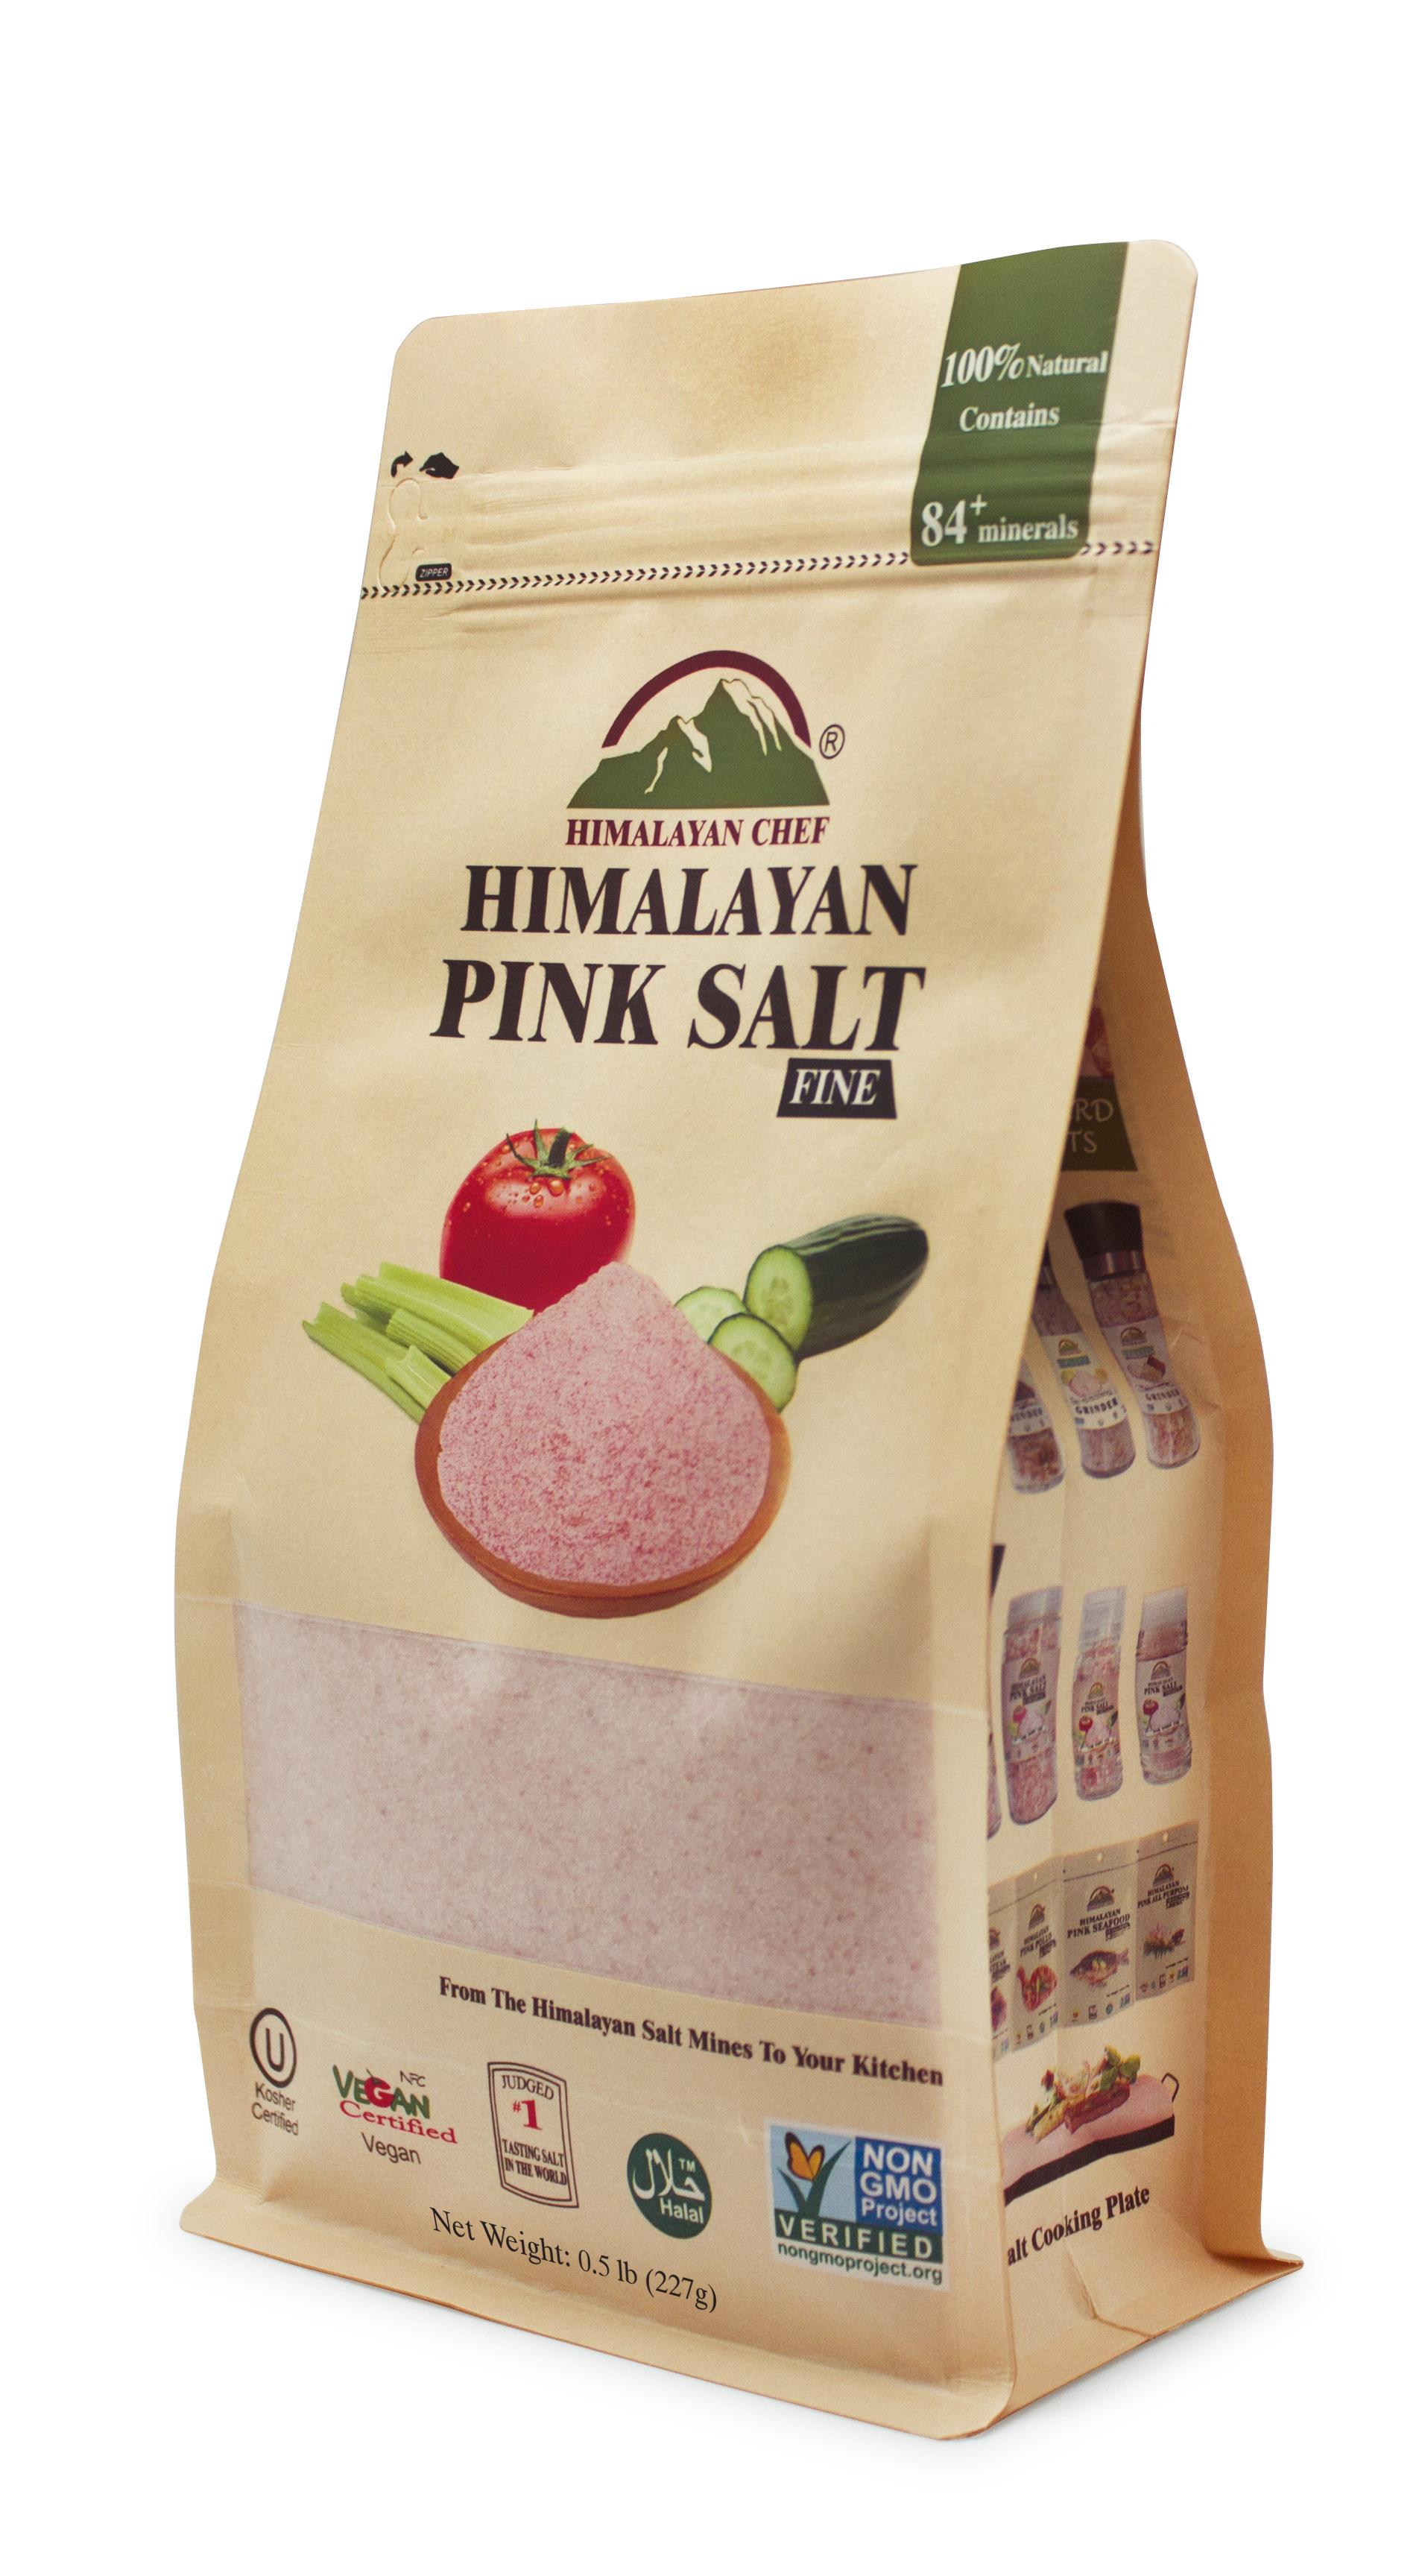 Натуральна Гімалайська рожева сіль, 227гр. Мілка. - купить в интернет-магазине Юнимед